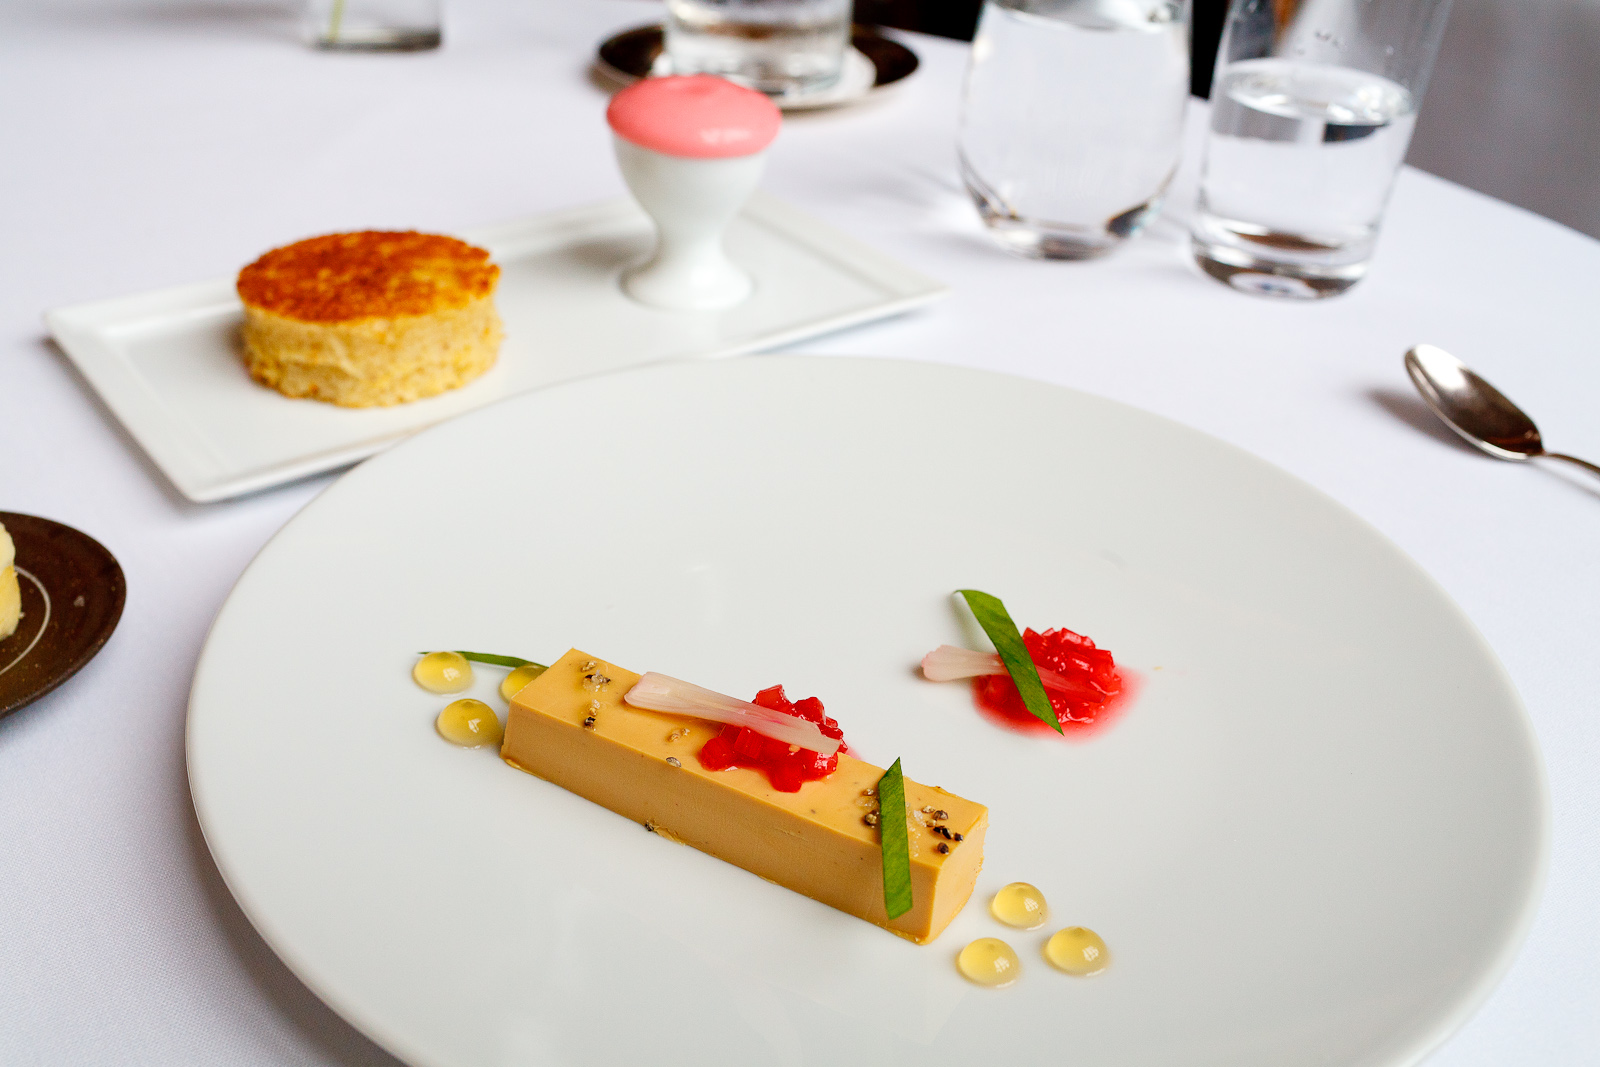 1st Course: Foie gras, rhubarb, tarragon, rhubarb foam, crustless black pepper brioche